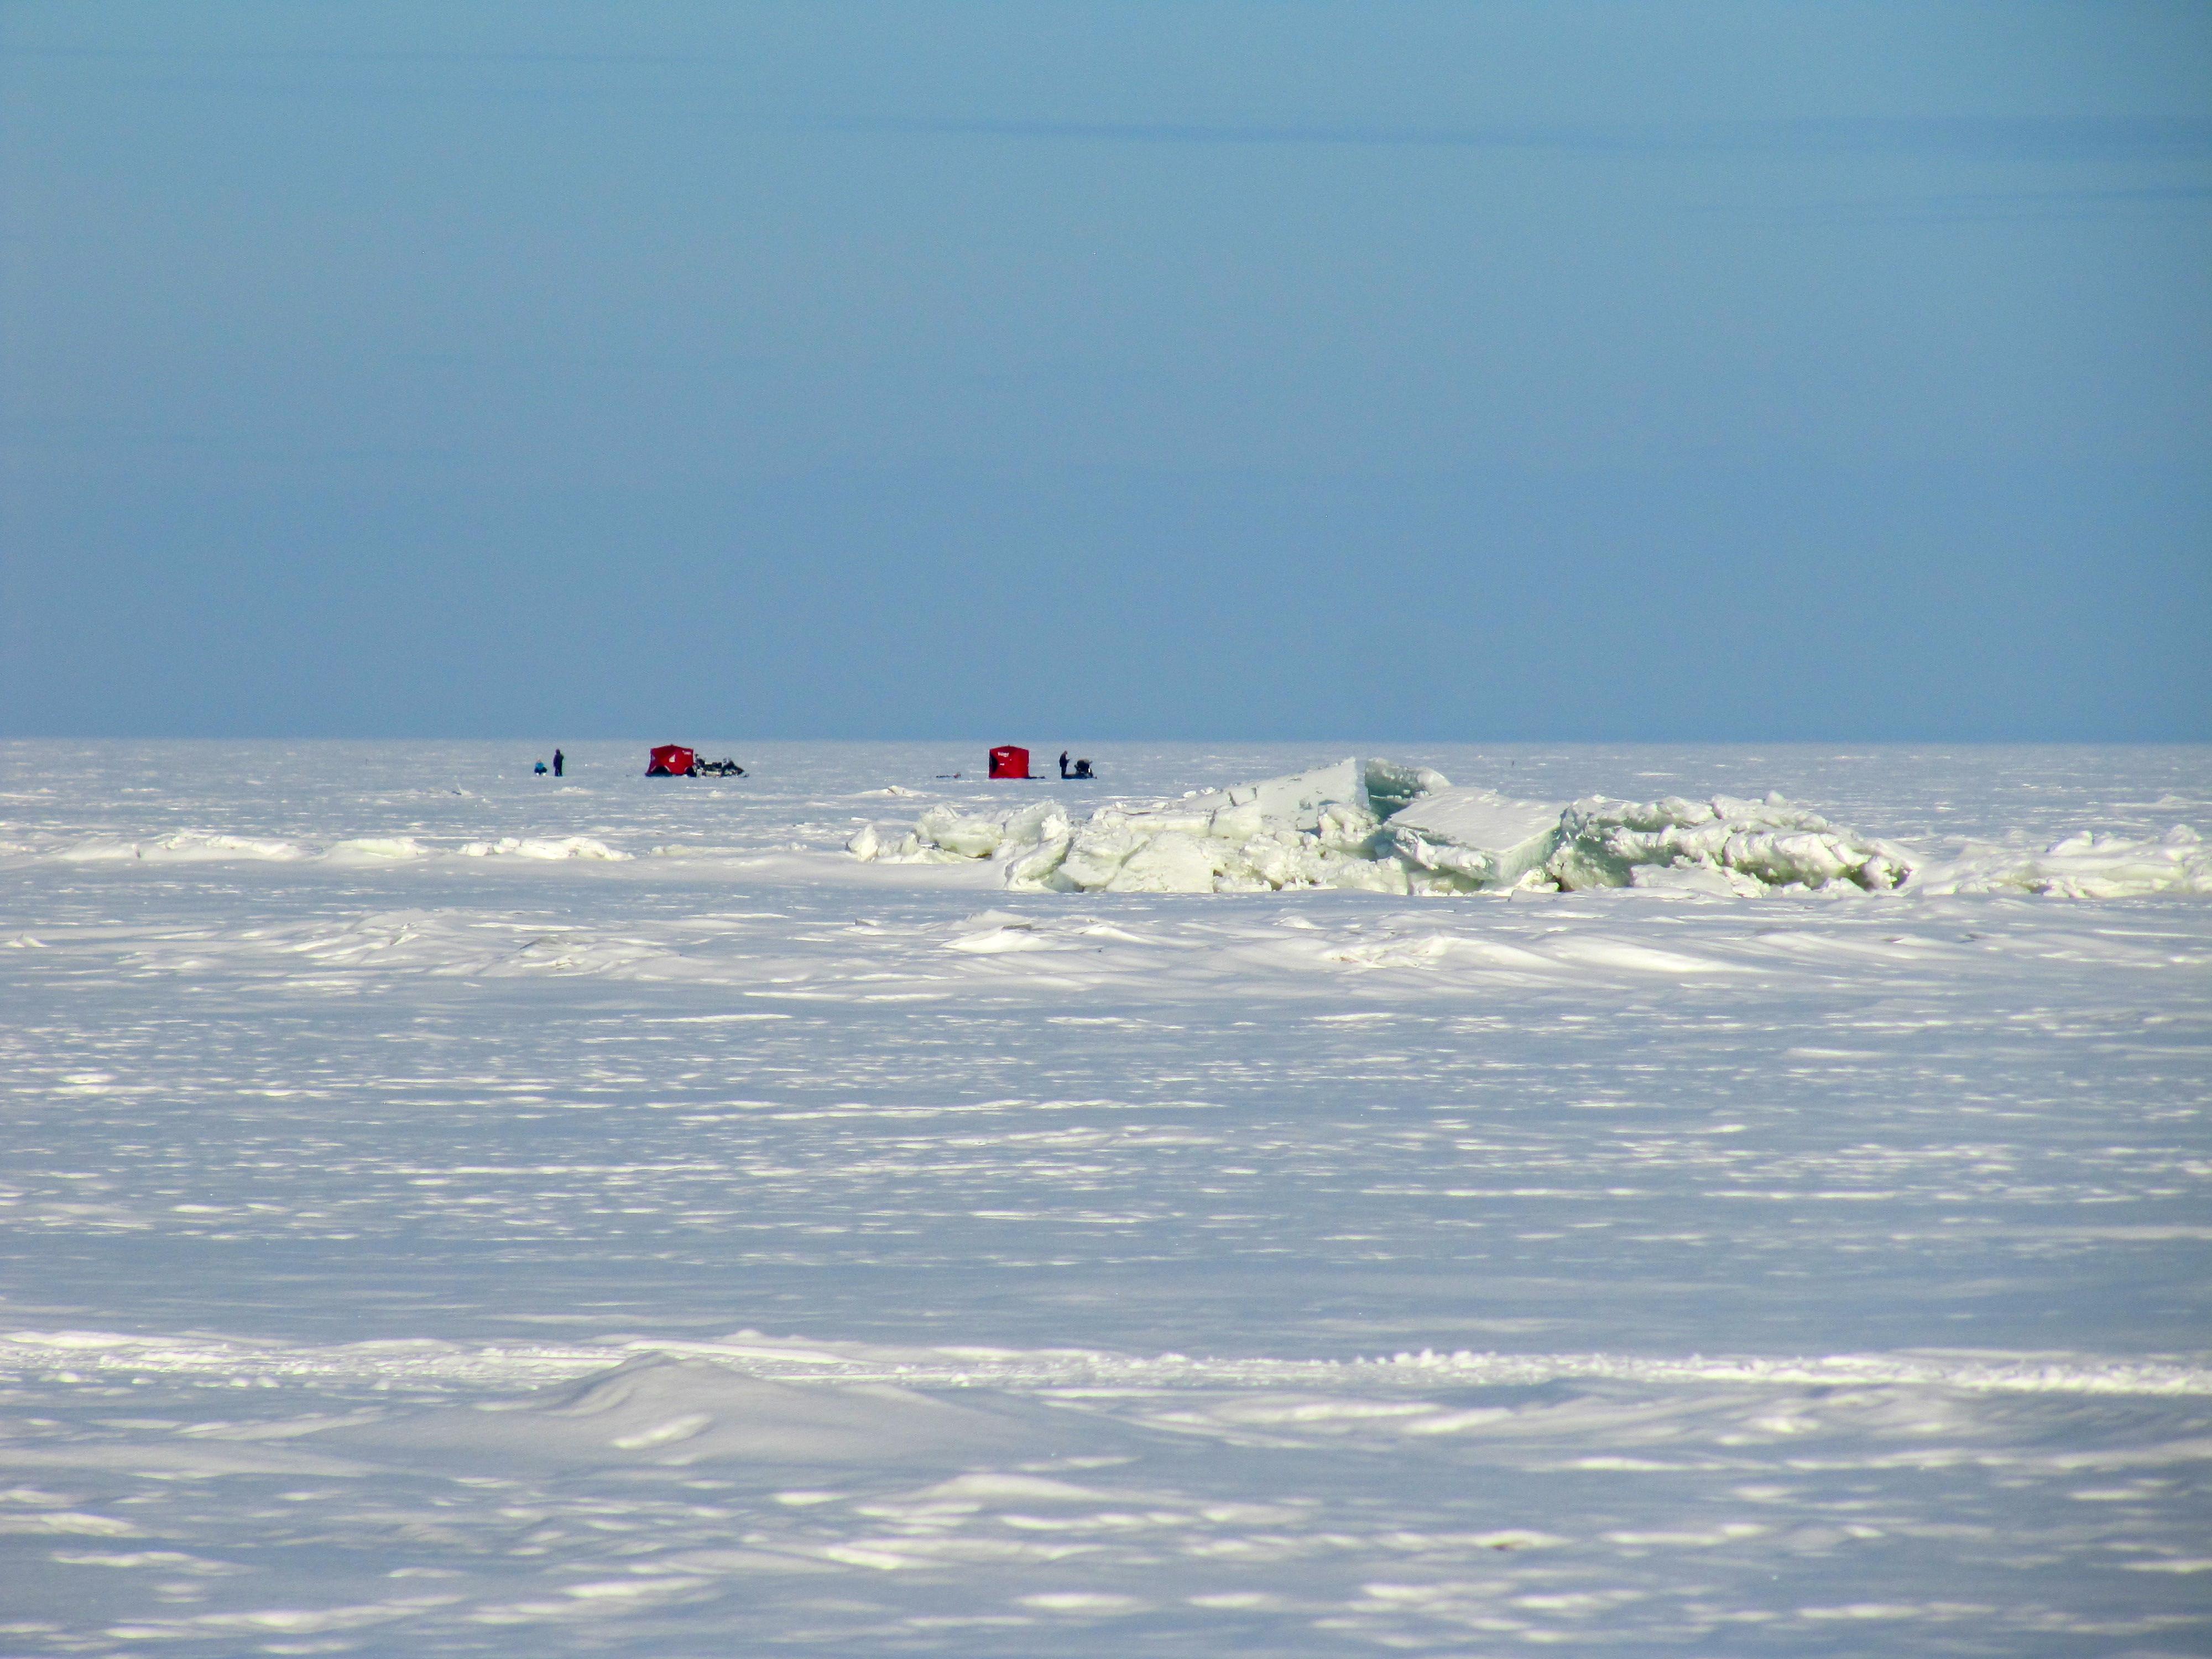 Lake winnipeg in february between brush strokes for Lake winnipeg ice fishing